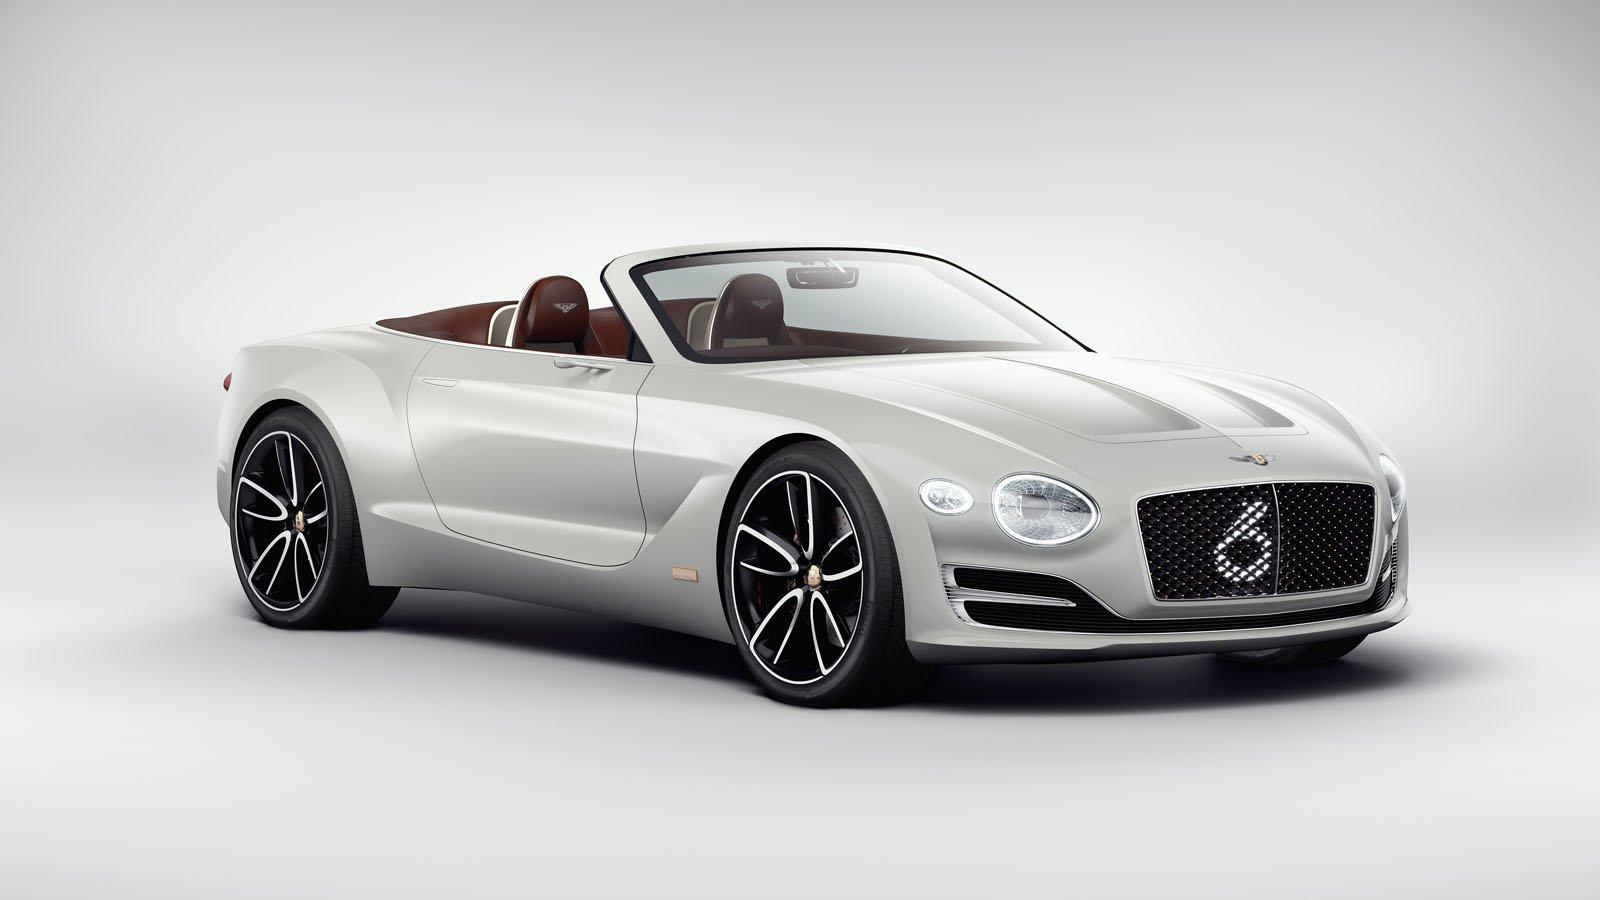 bentley-bentley-exp-12-speed-6e-concept-02